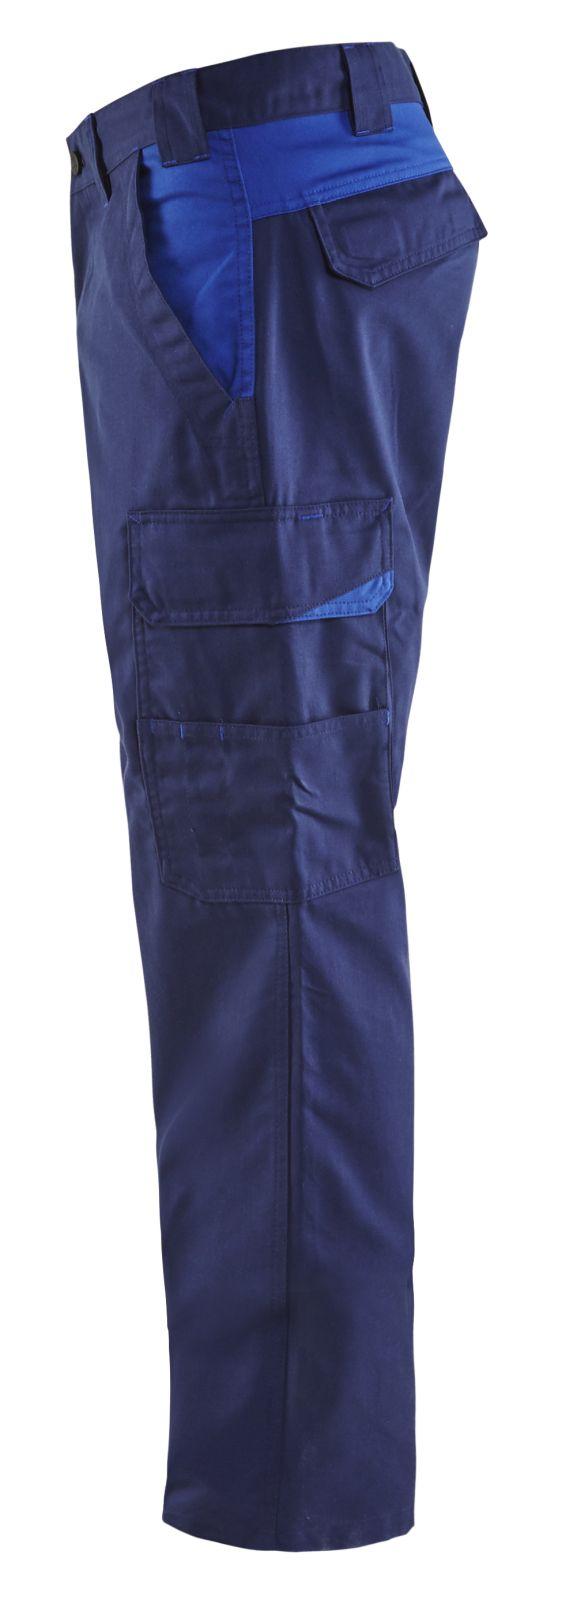 Blaklader Werkbroeken 14041800 marineblauw-korenblauw(8985)